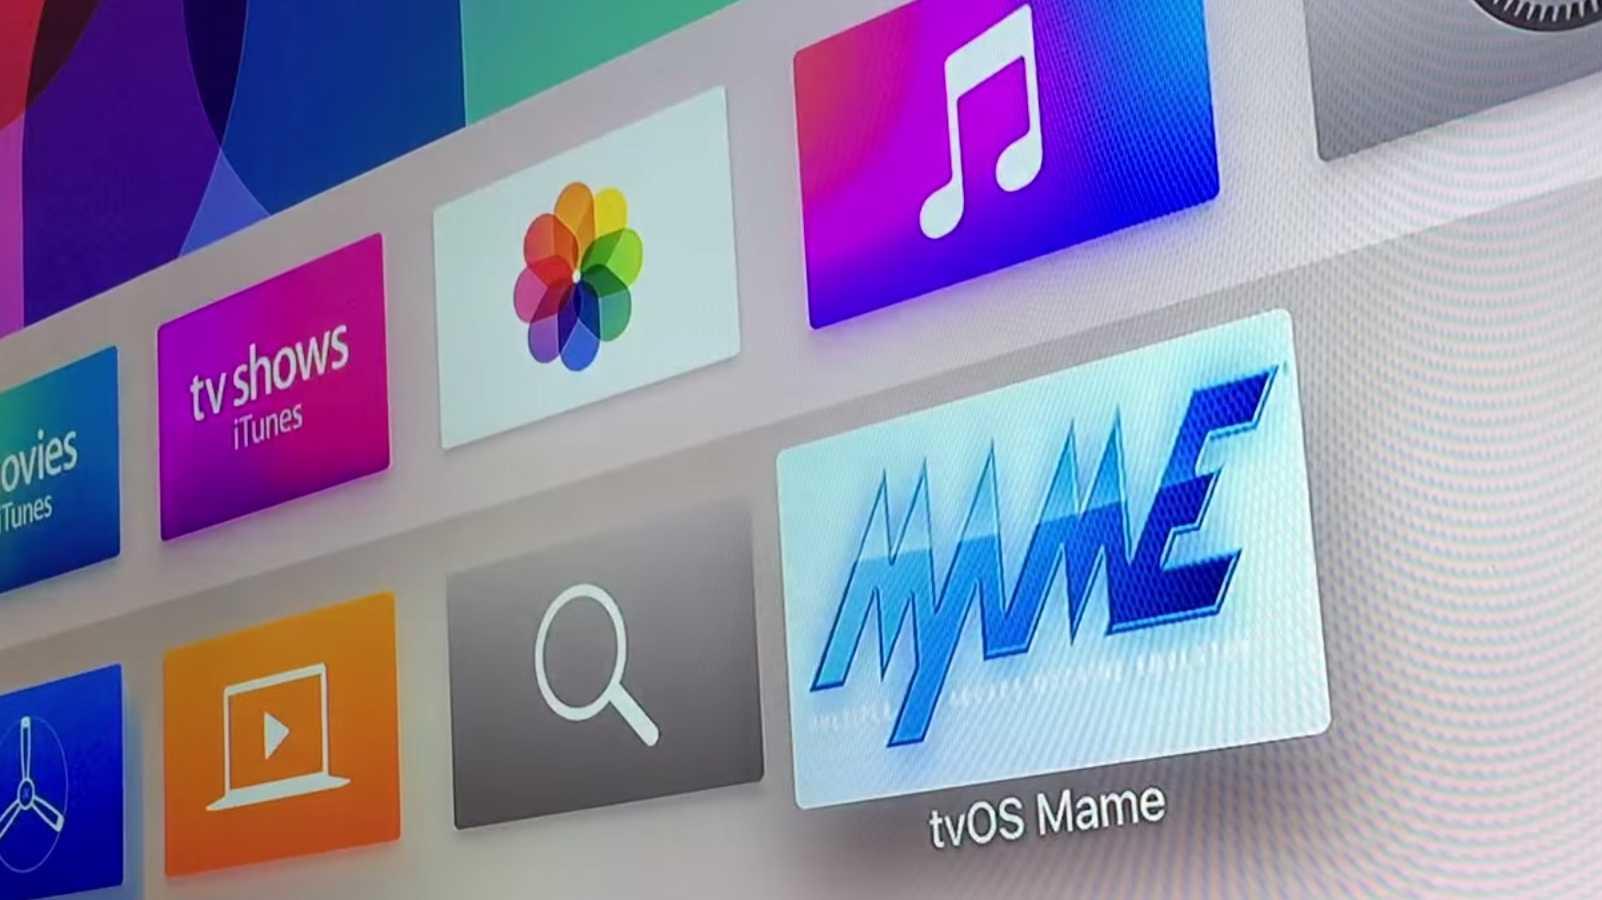 MAME Emulator läuft auf tvOS